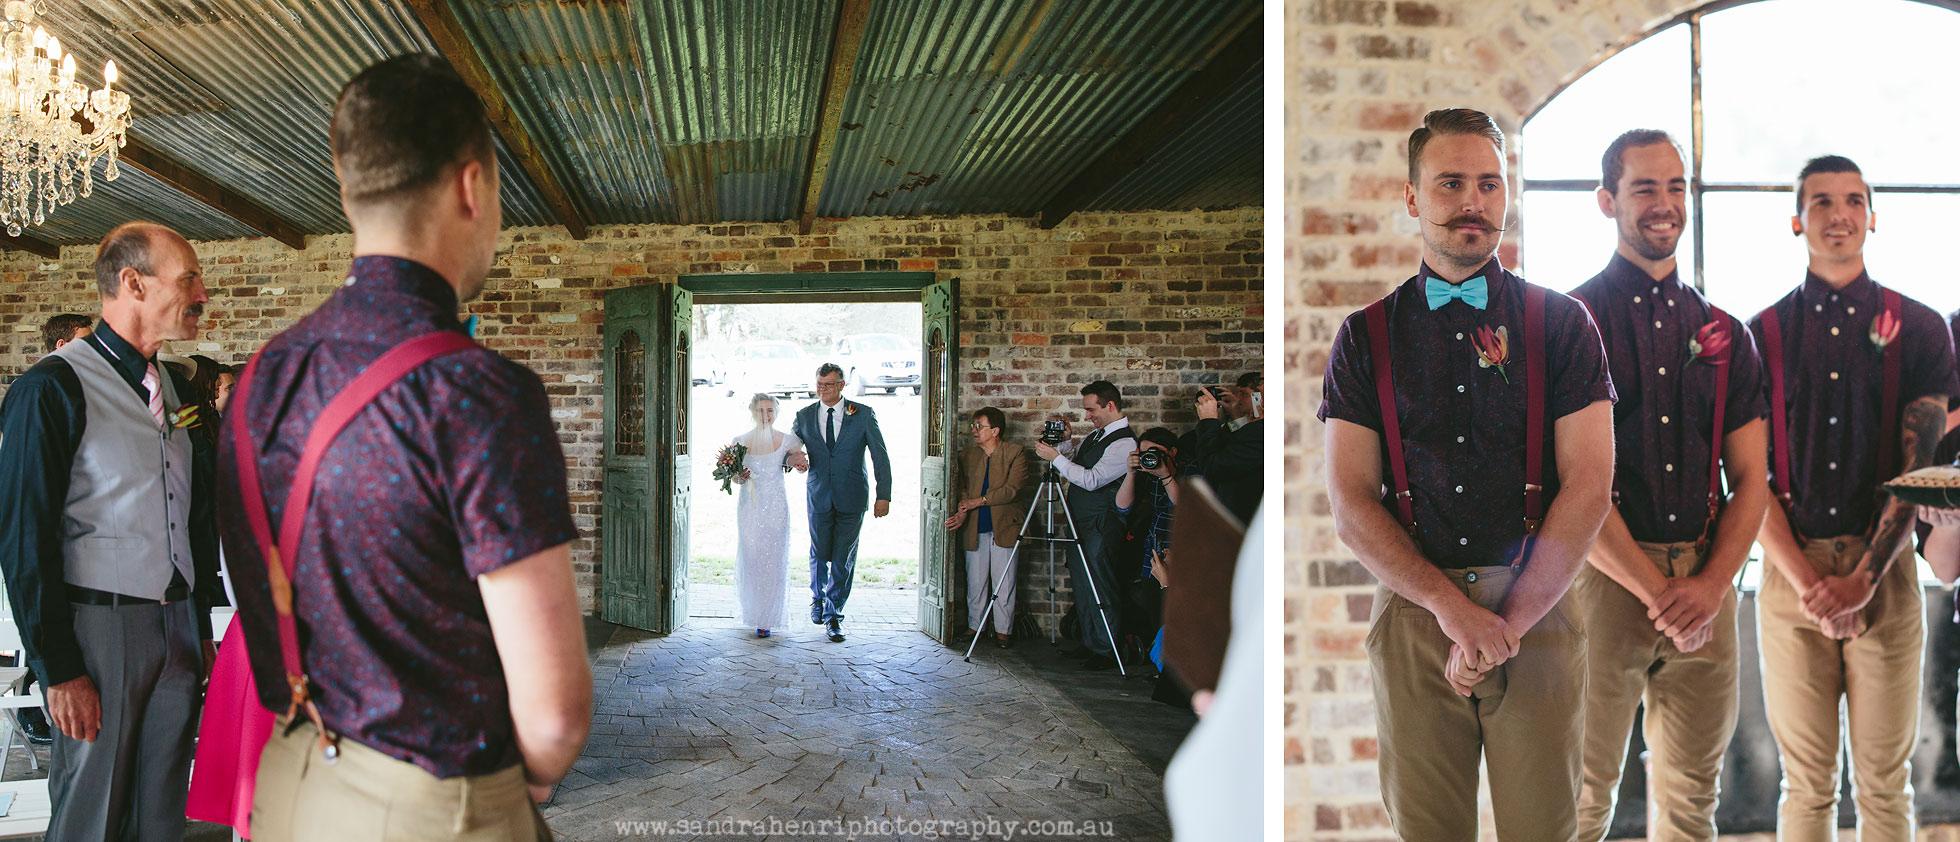 Wedding-photographer-Mali-Brae-Farm-25.jpg